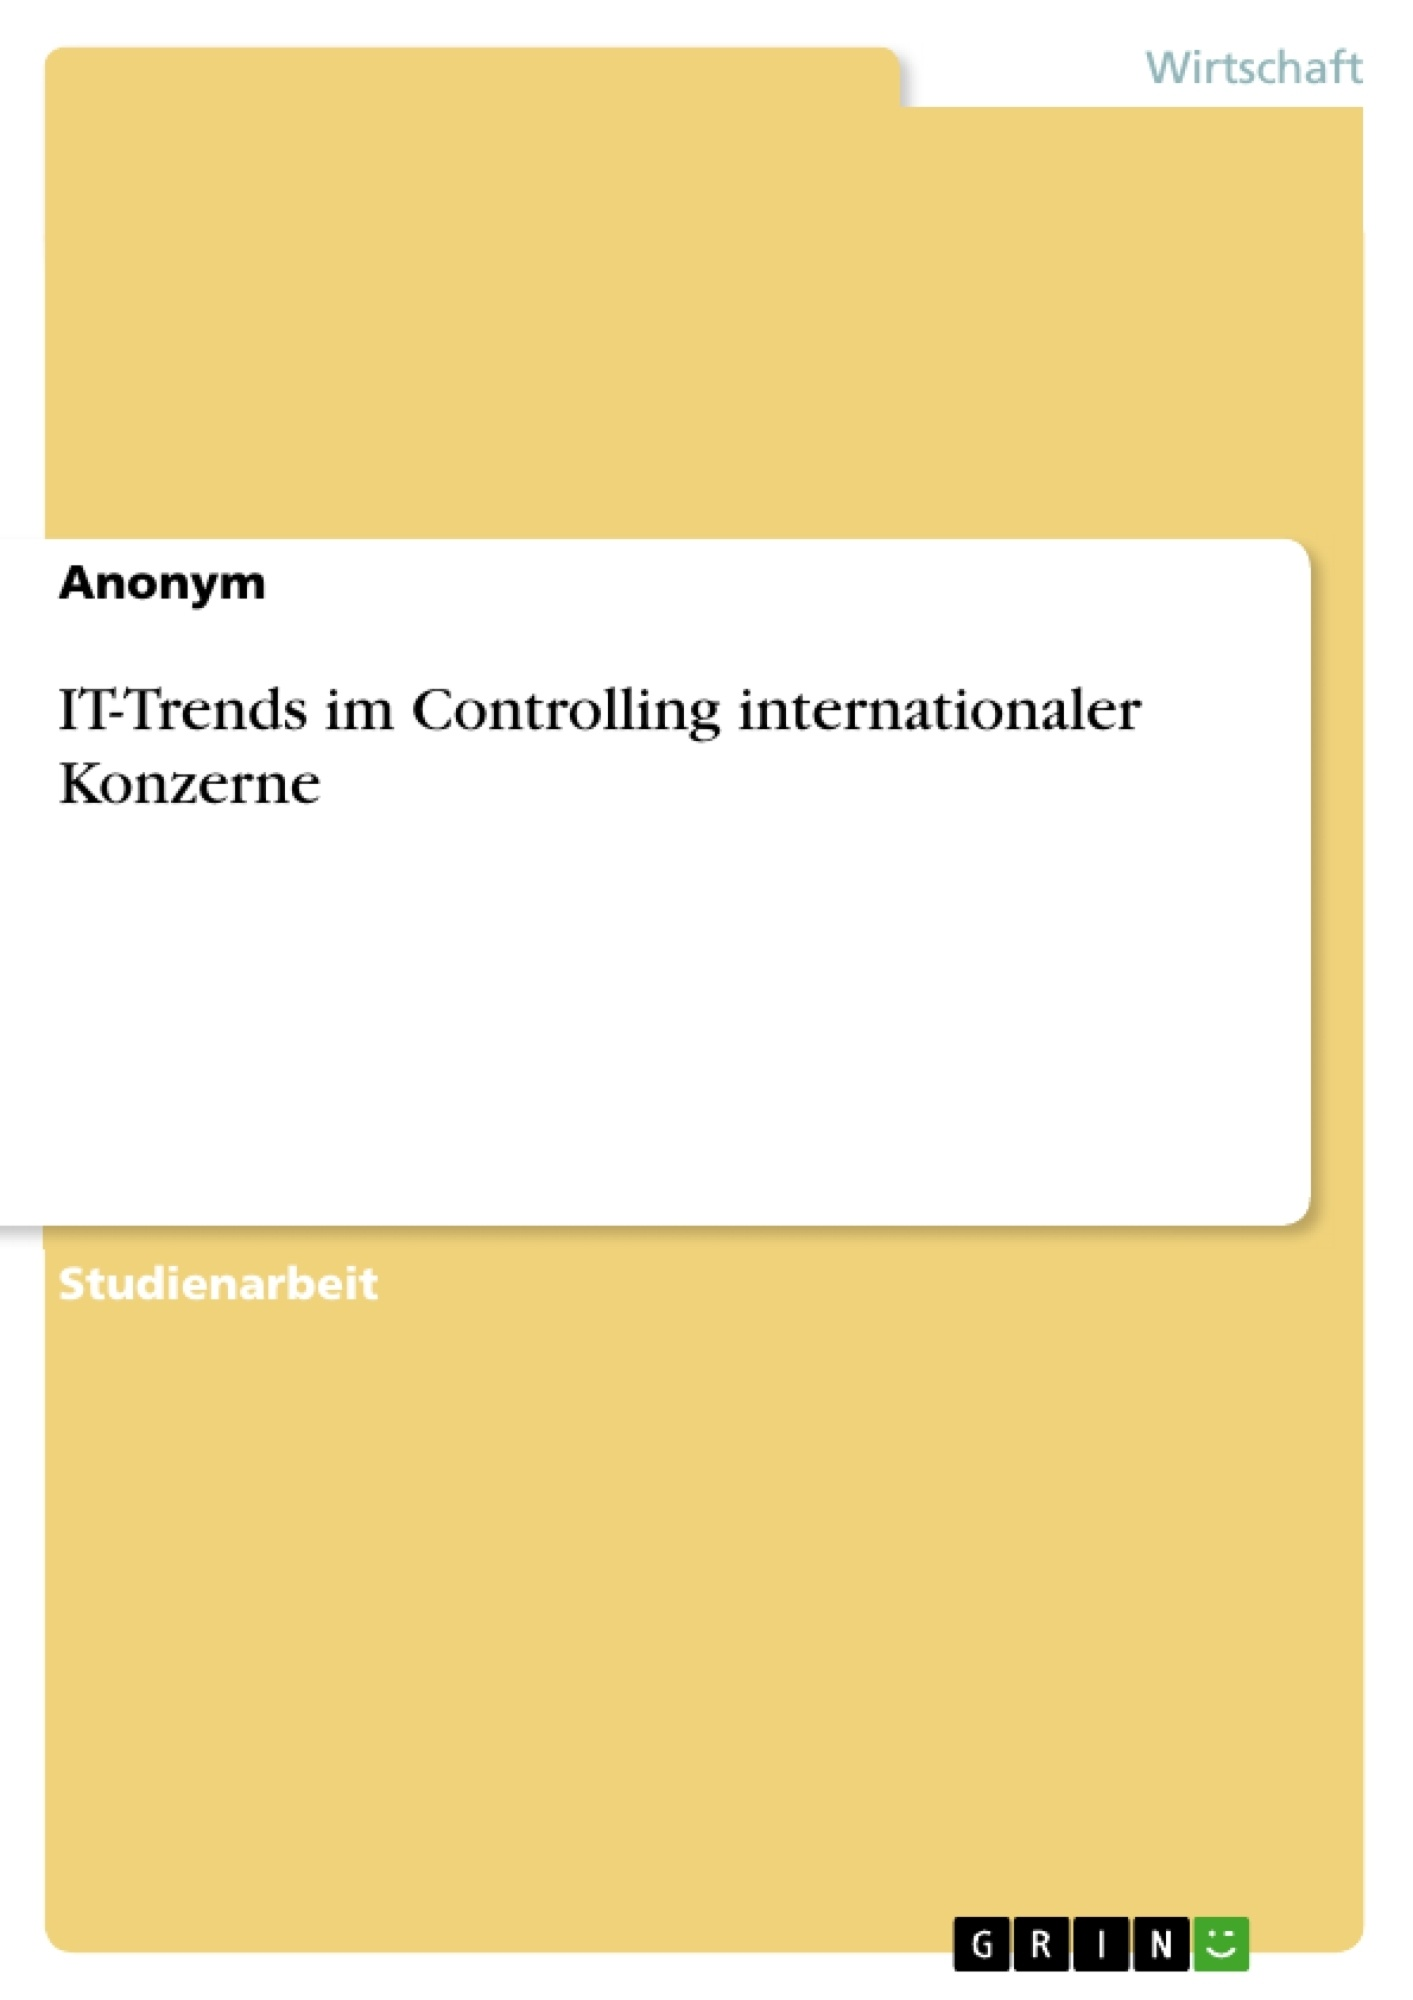 Titel: IT-Trends im Controlling internationaler Konzerne